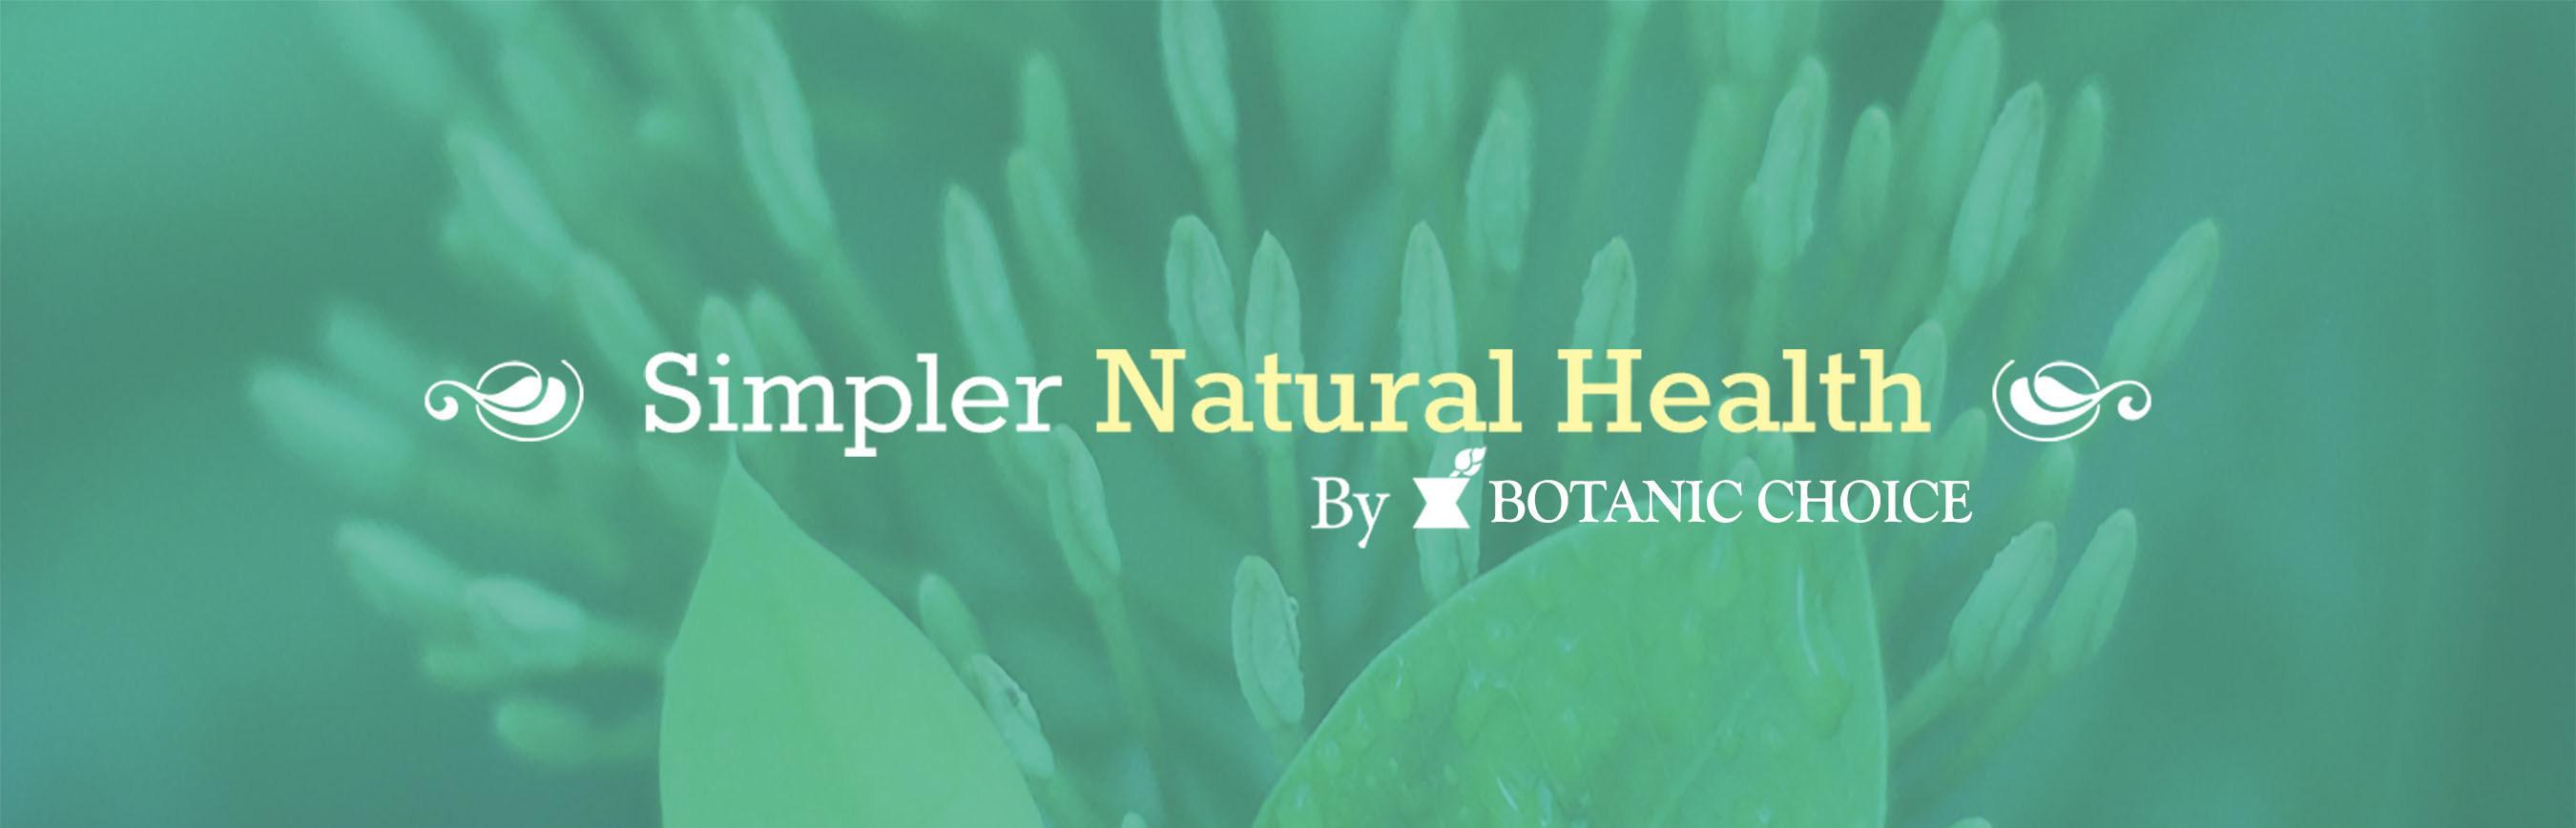 Indiana Botanic Gardens President Launches Natural Health Blog